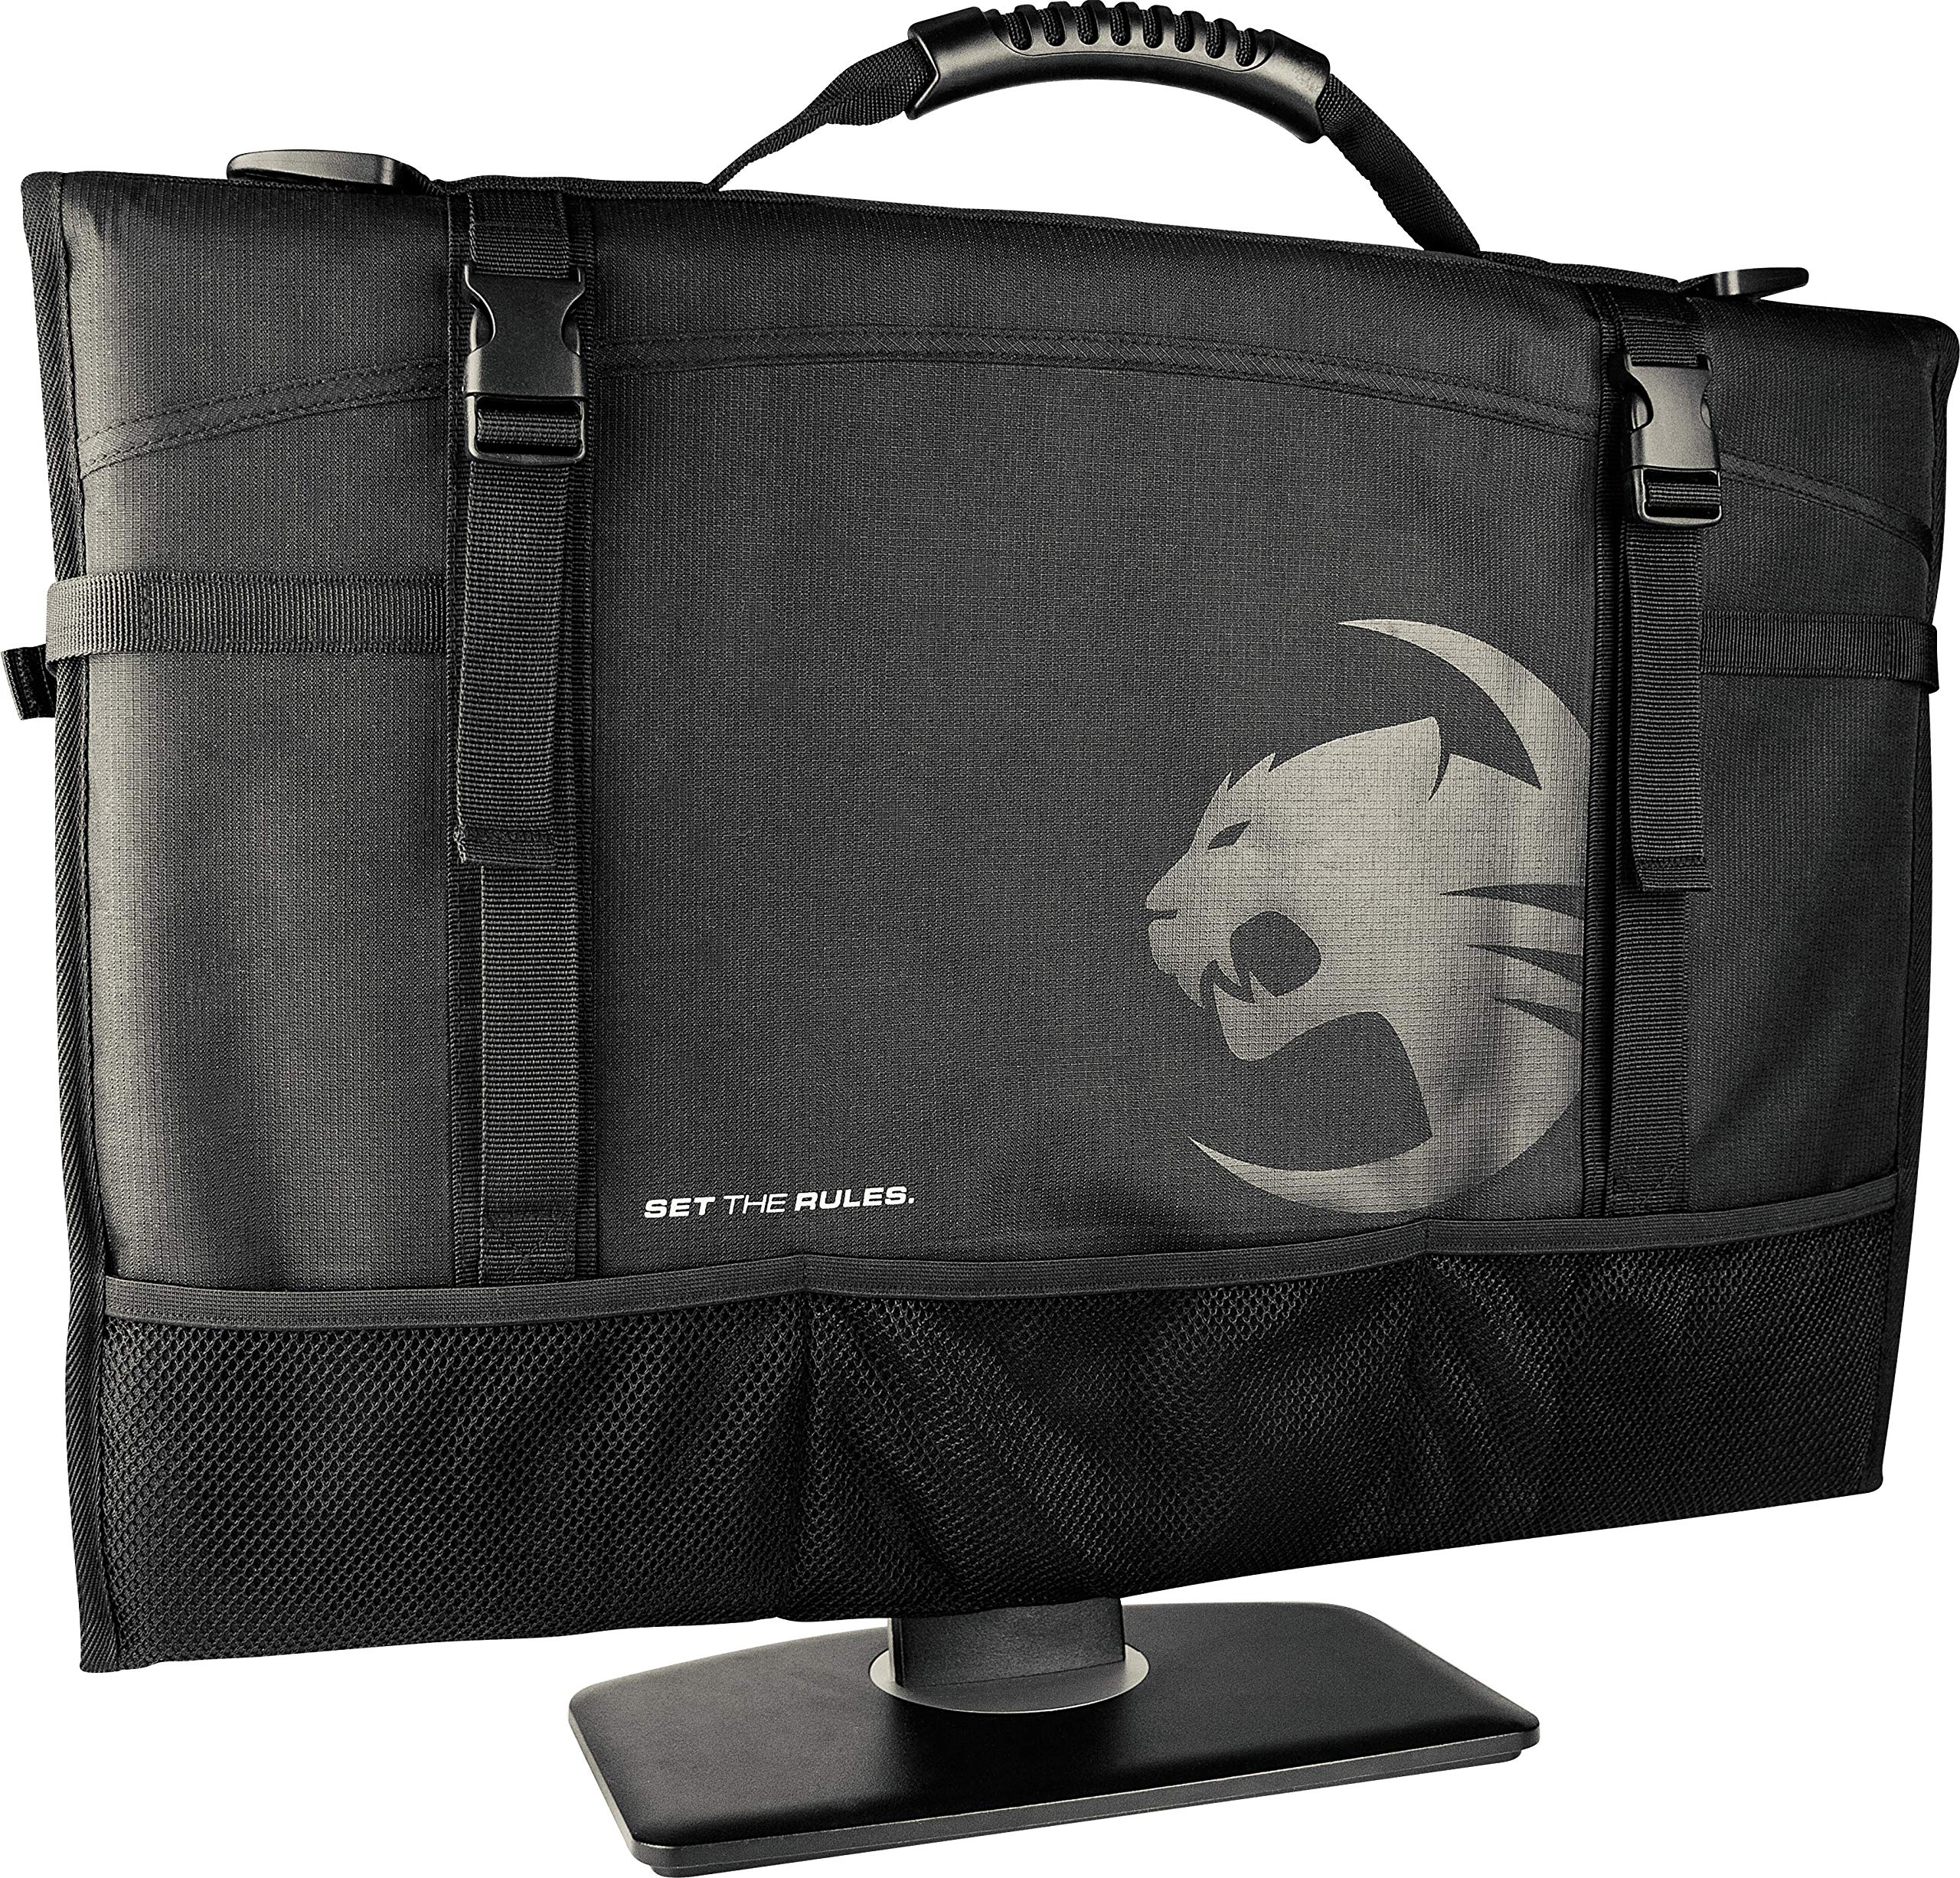 ROCCAT Latest Version Tusko Across-The-Board Flat Screen/Widescreen Bag, Black by ROCCAT (Image #1)